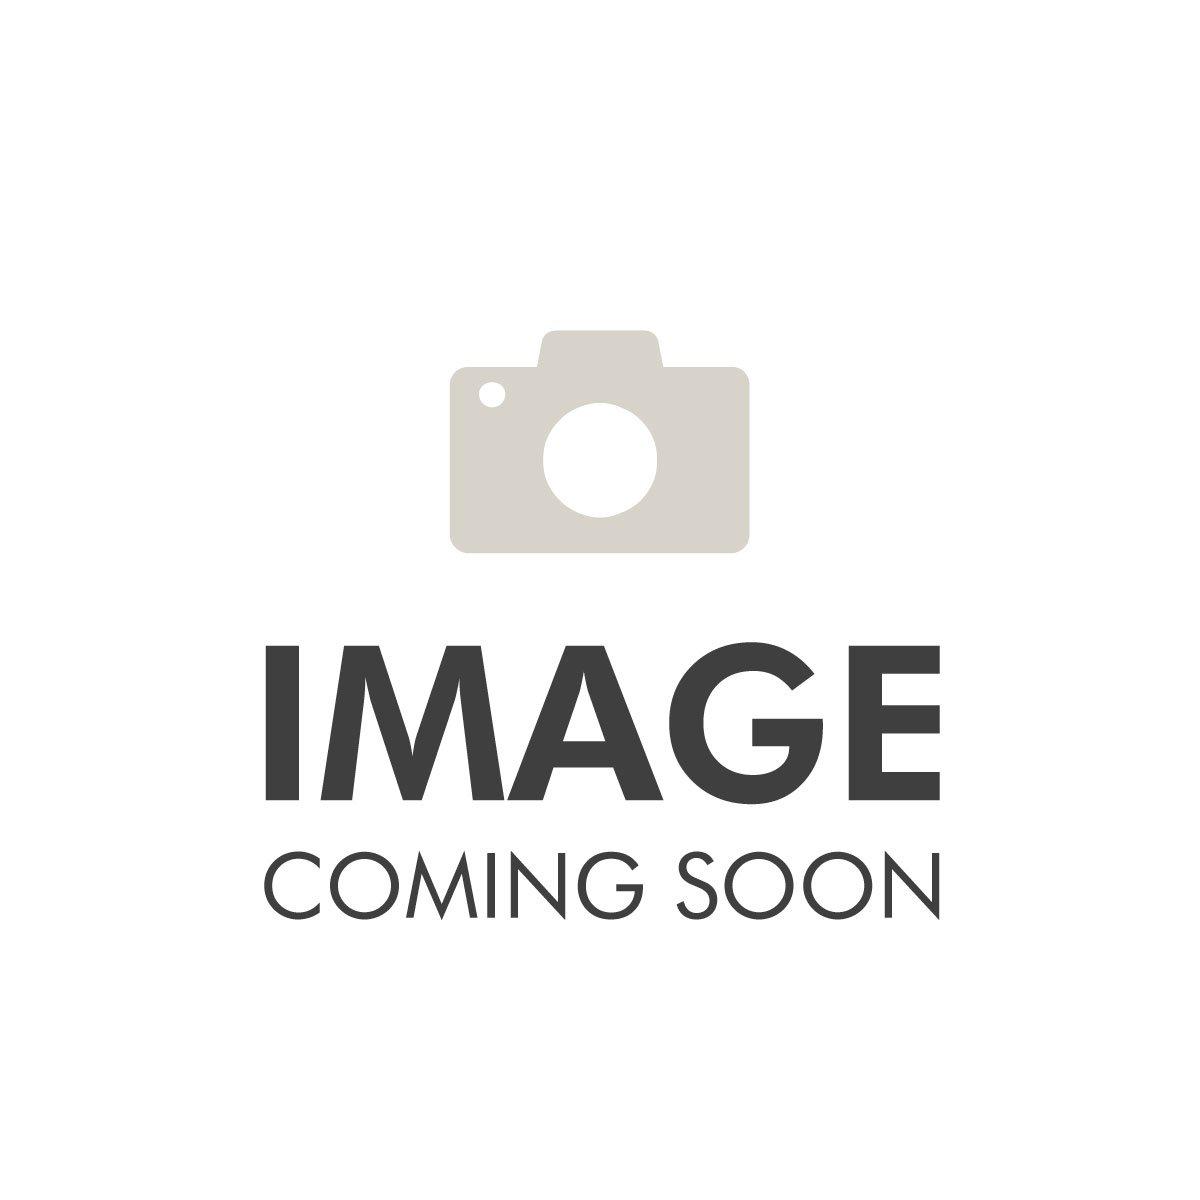 Clarins Ombre Matte 10 Midnight Blue